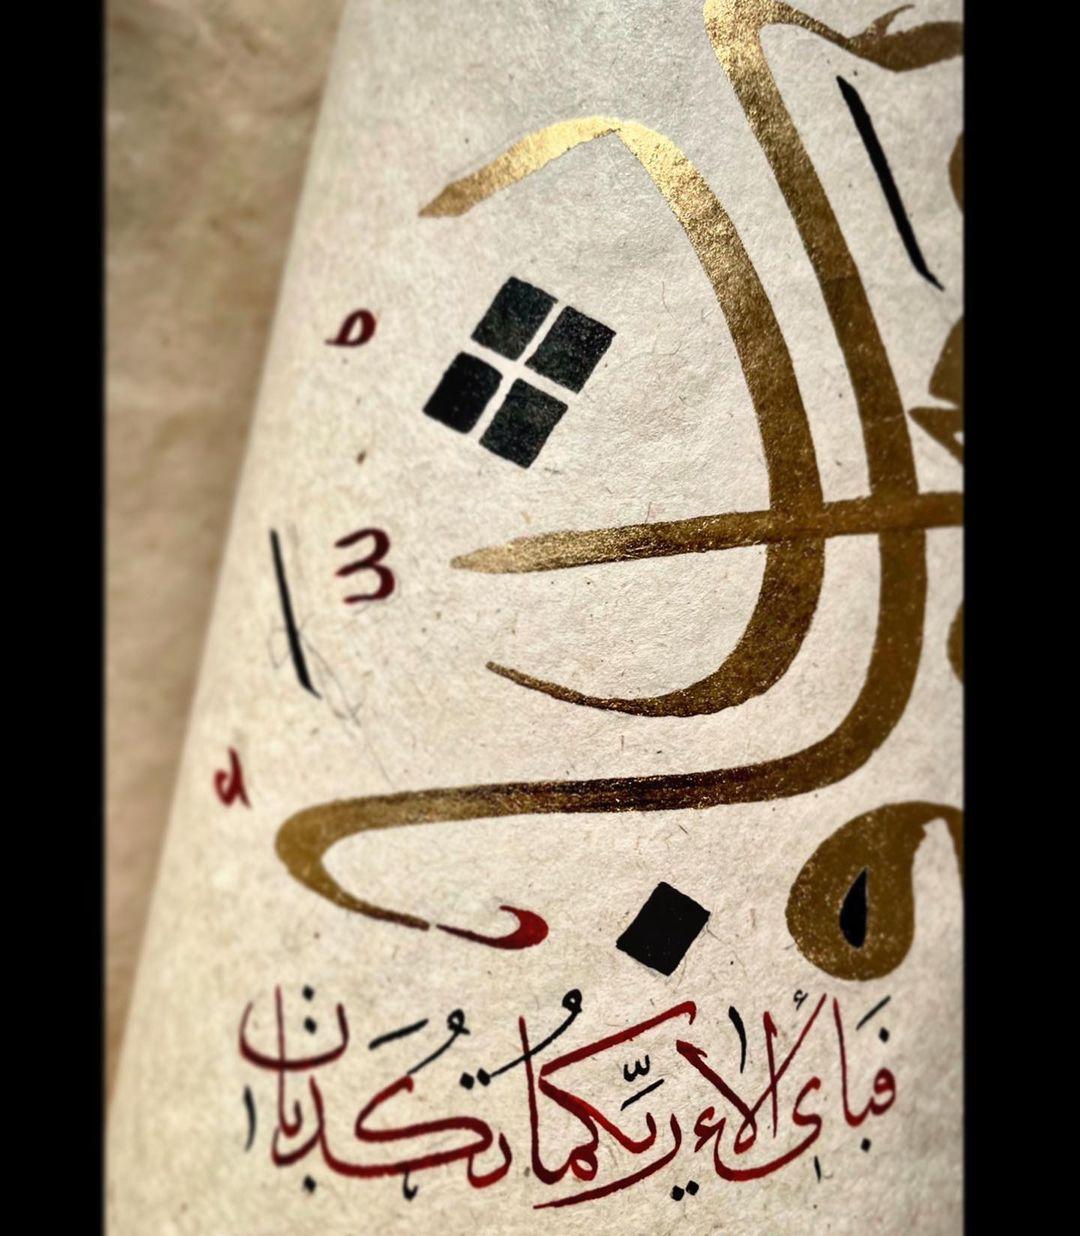 Karya Kaligrafi خرجَ رسولُ اللَّهِ صلَّى اللَّهُ علَيهِ وسلَّمَ على أَصحابِهِ، فقرأَ عليهم سورةَ…- jasssim Meraj